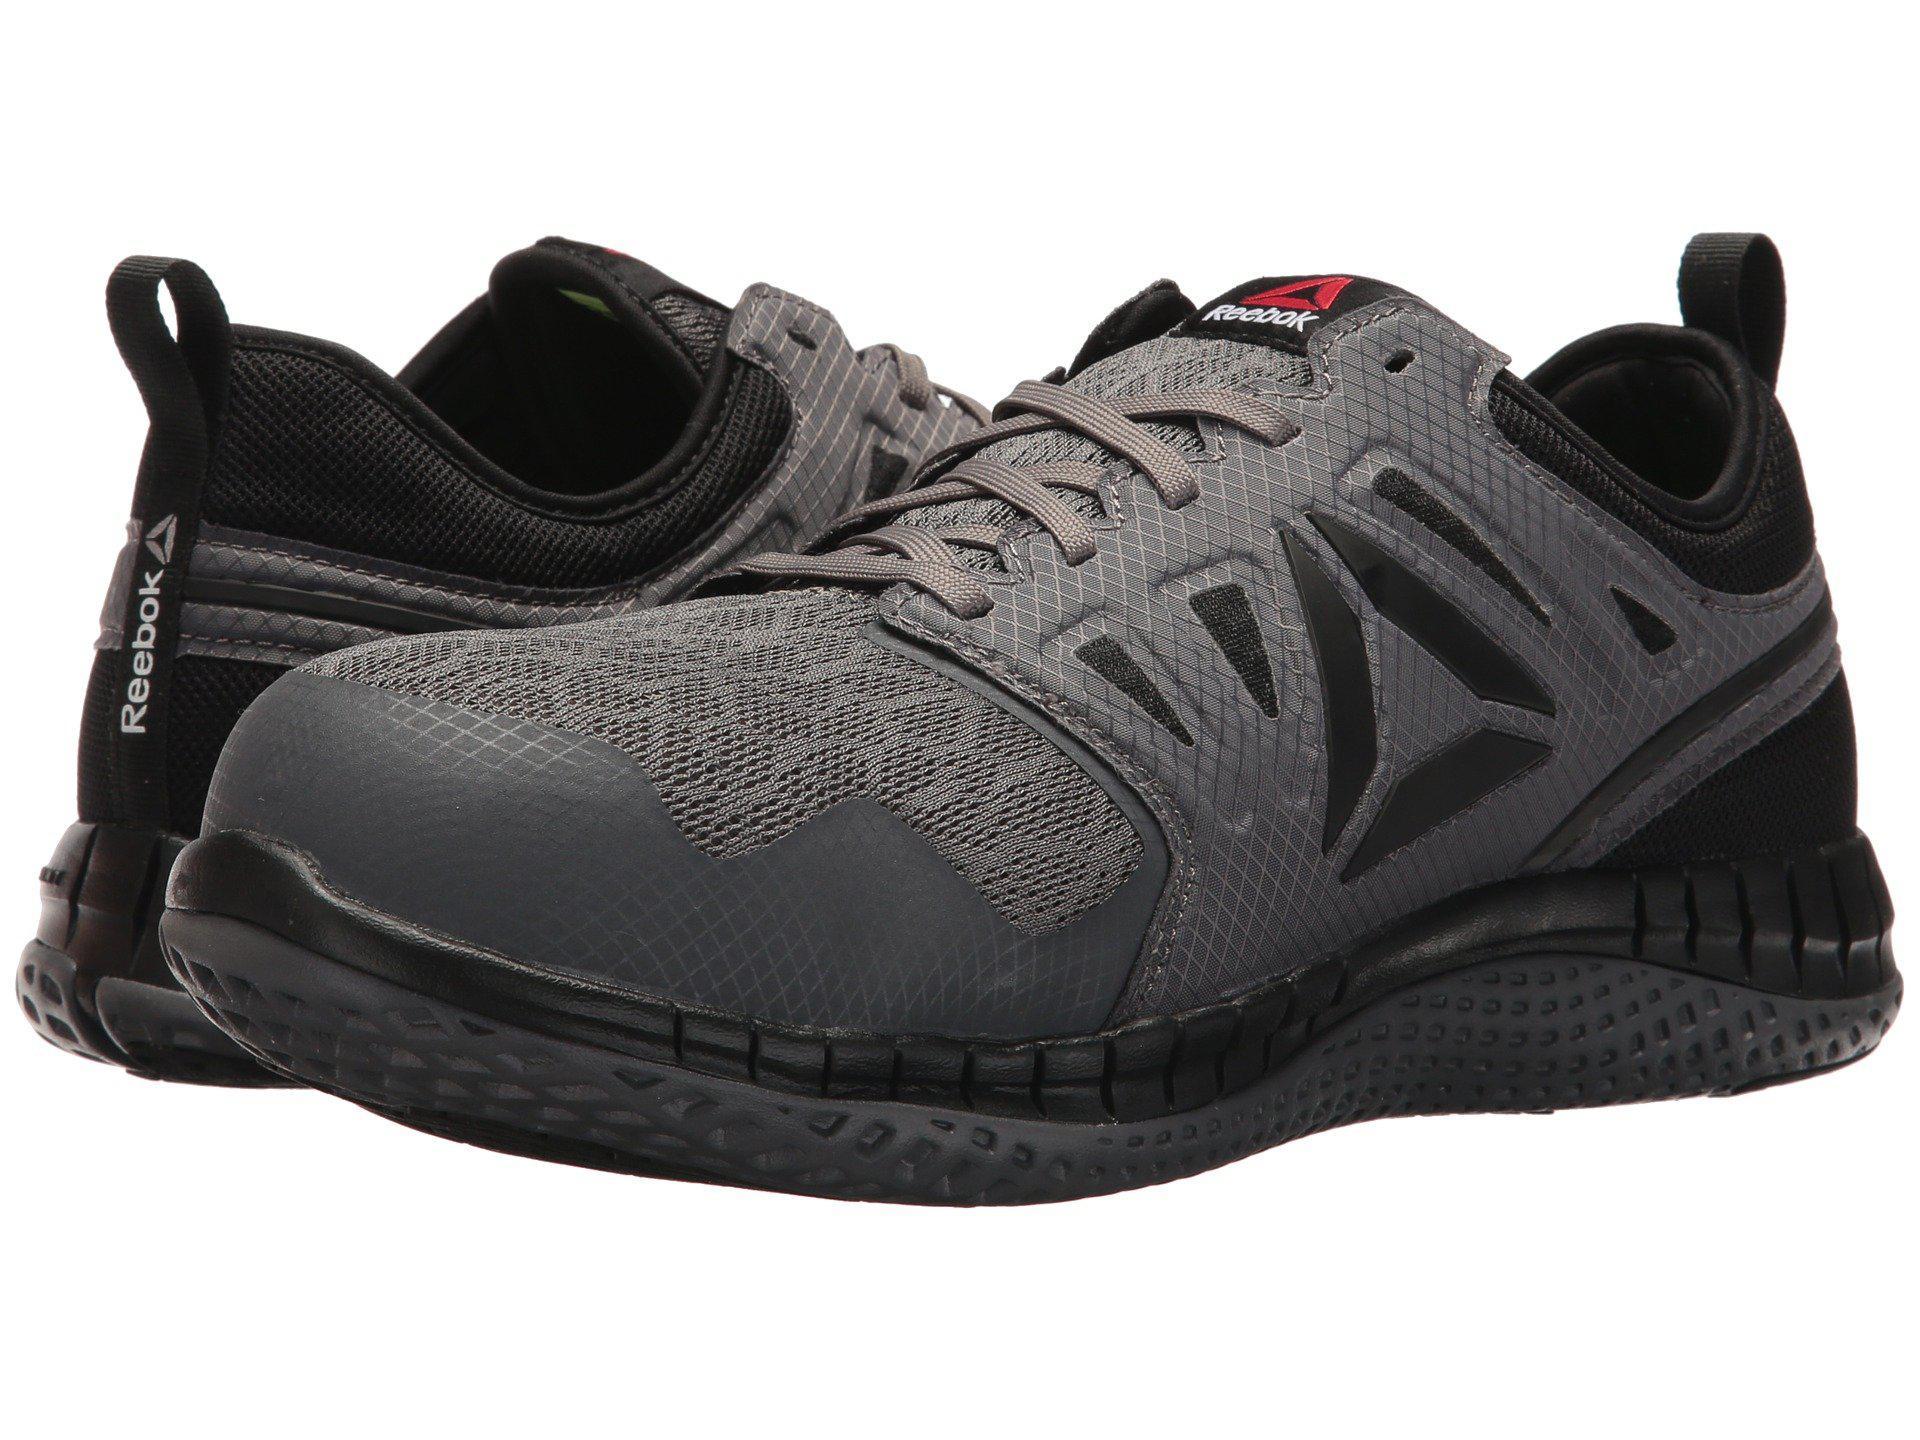 c2b6d58516fa Lyst - Reebok Zprint Work (navy red grey) Men s Shoes in Gray for Men